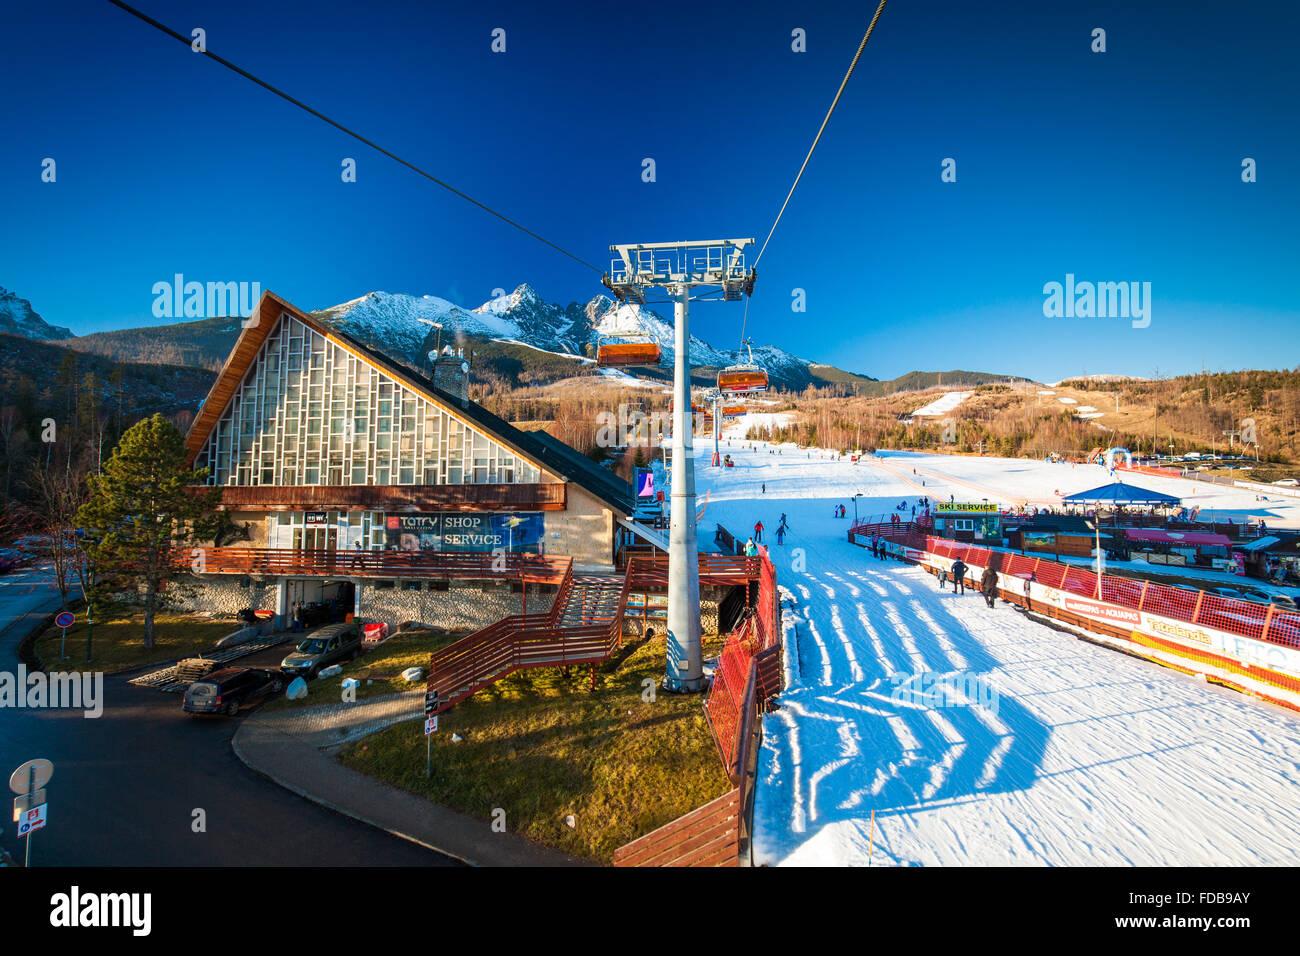 TATRANSKA LOMNICA, Slowakei, 23. Dezember 2015: Seilbahn auf ein beliebtes Skigebiet in Tatranska Lomnica, Tatra, Stockbild